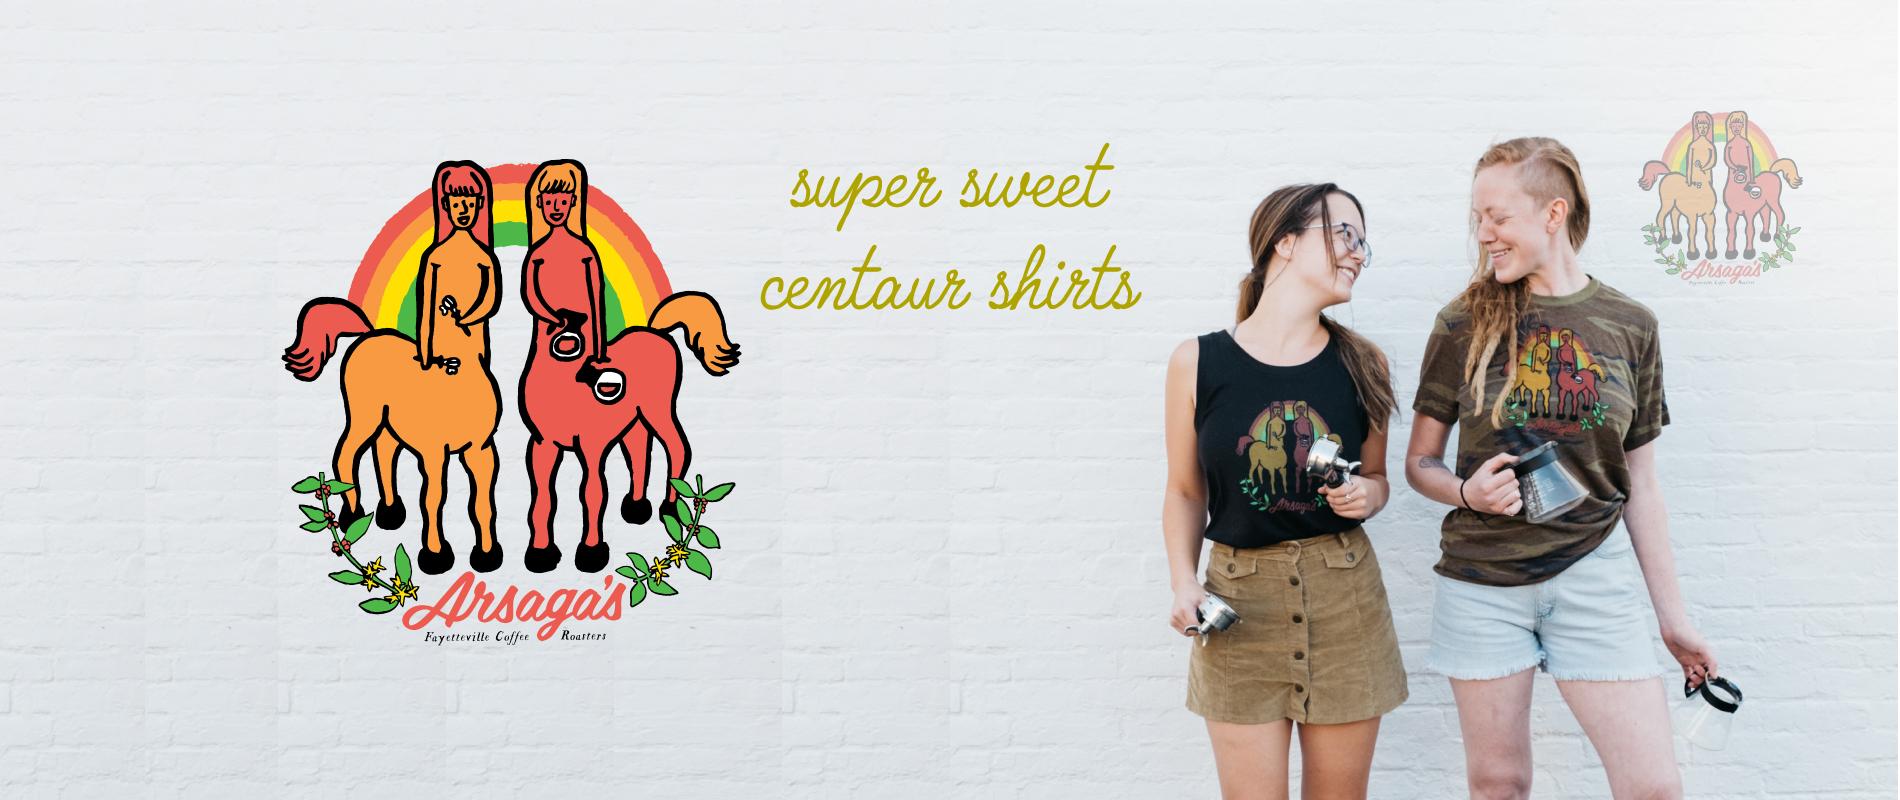 centaur-tshirt-promo-copy3.jpg